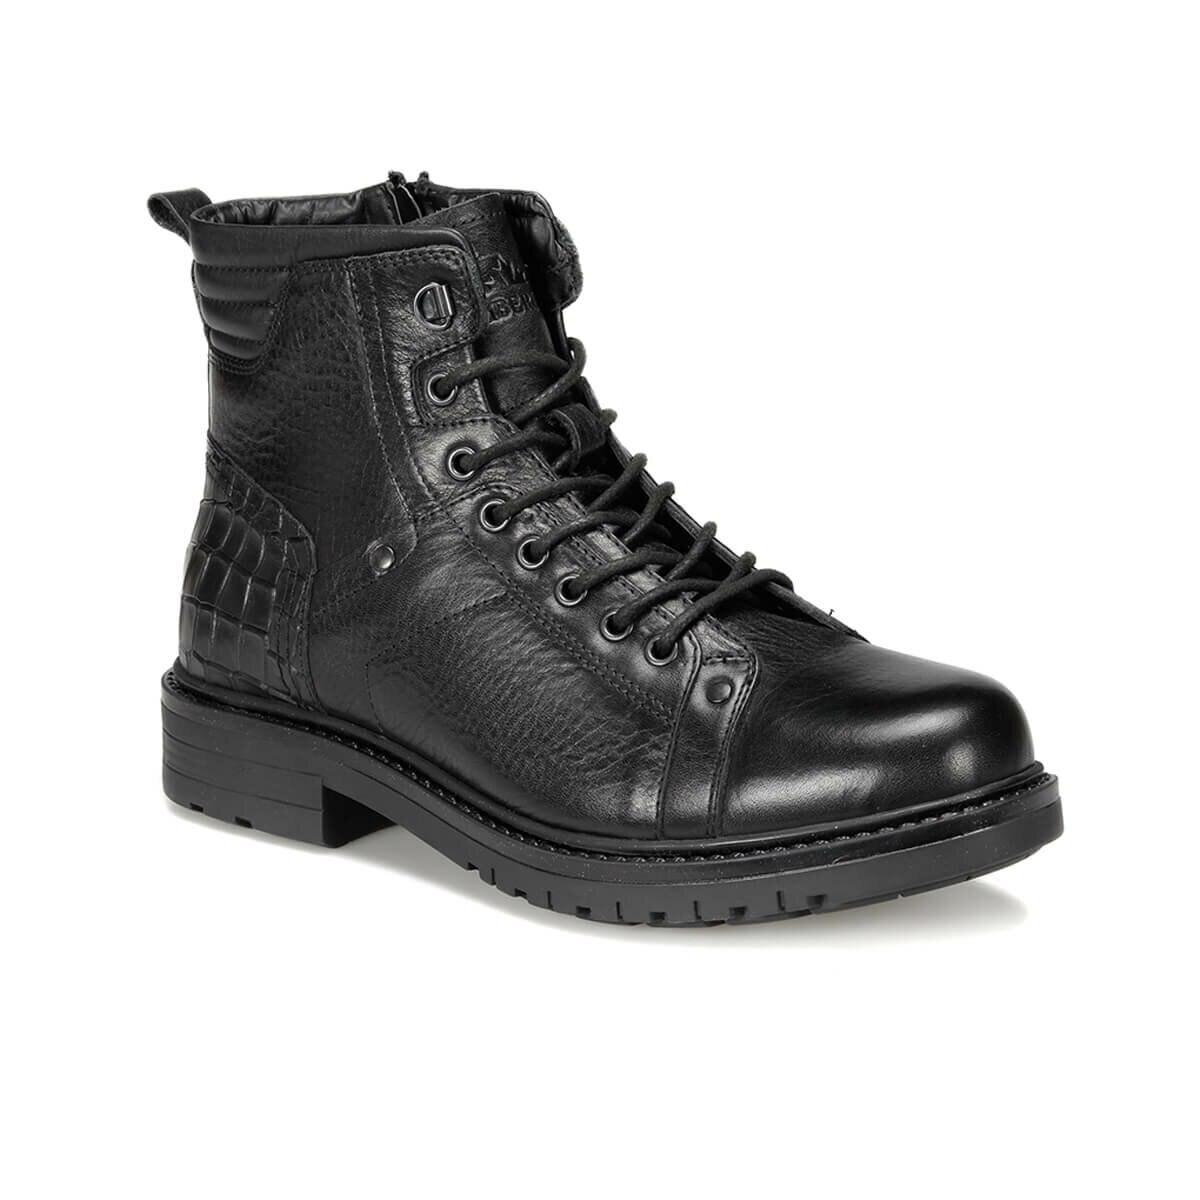 FLO MALERO 9PR Black Men Boots LUMBERJACK